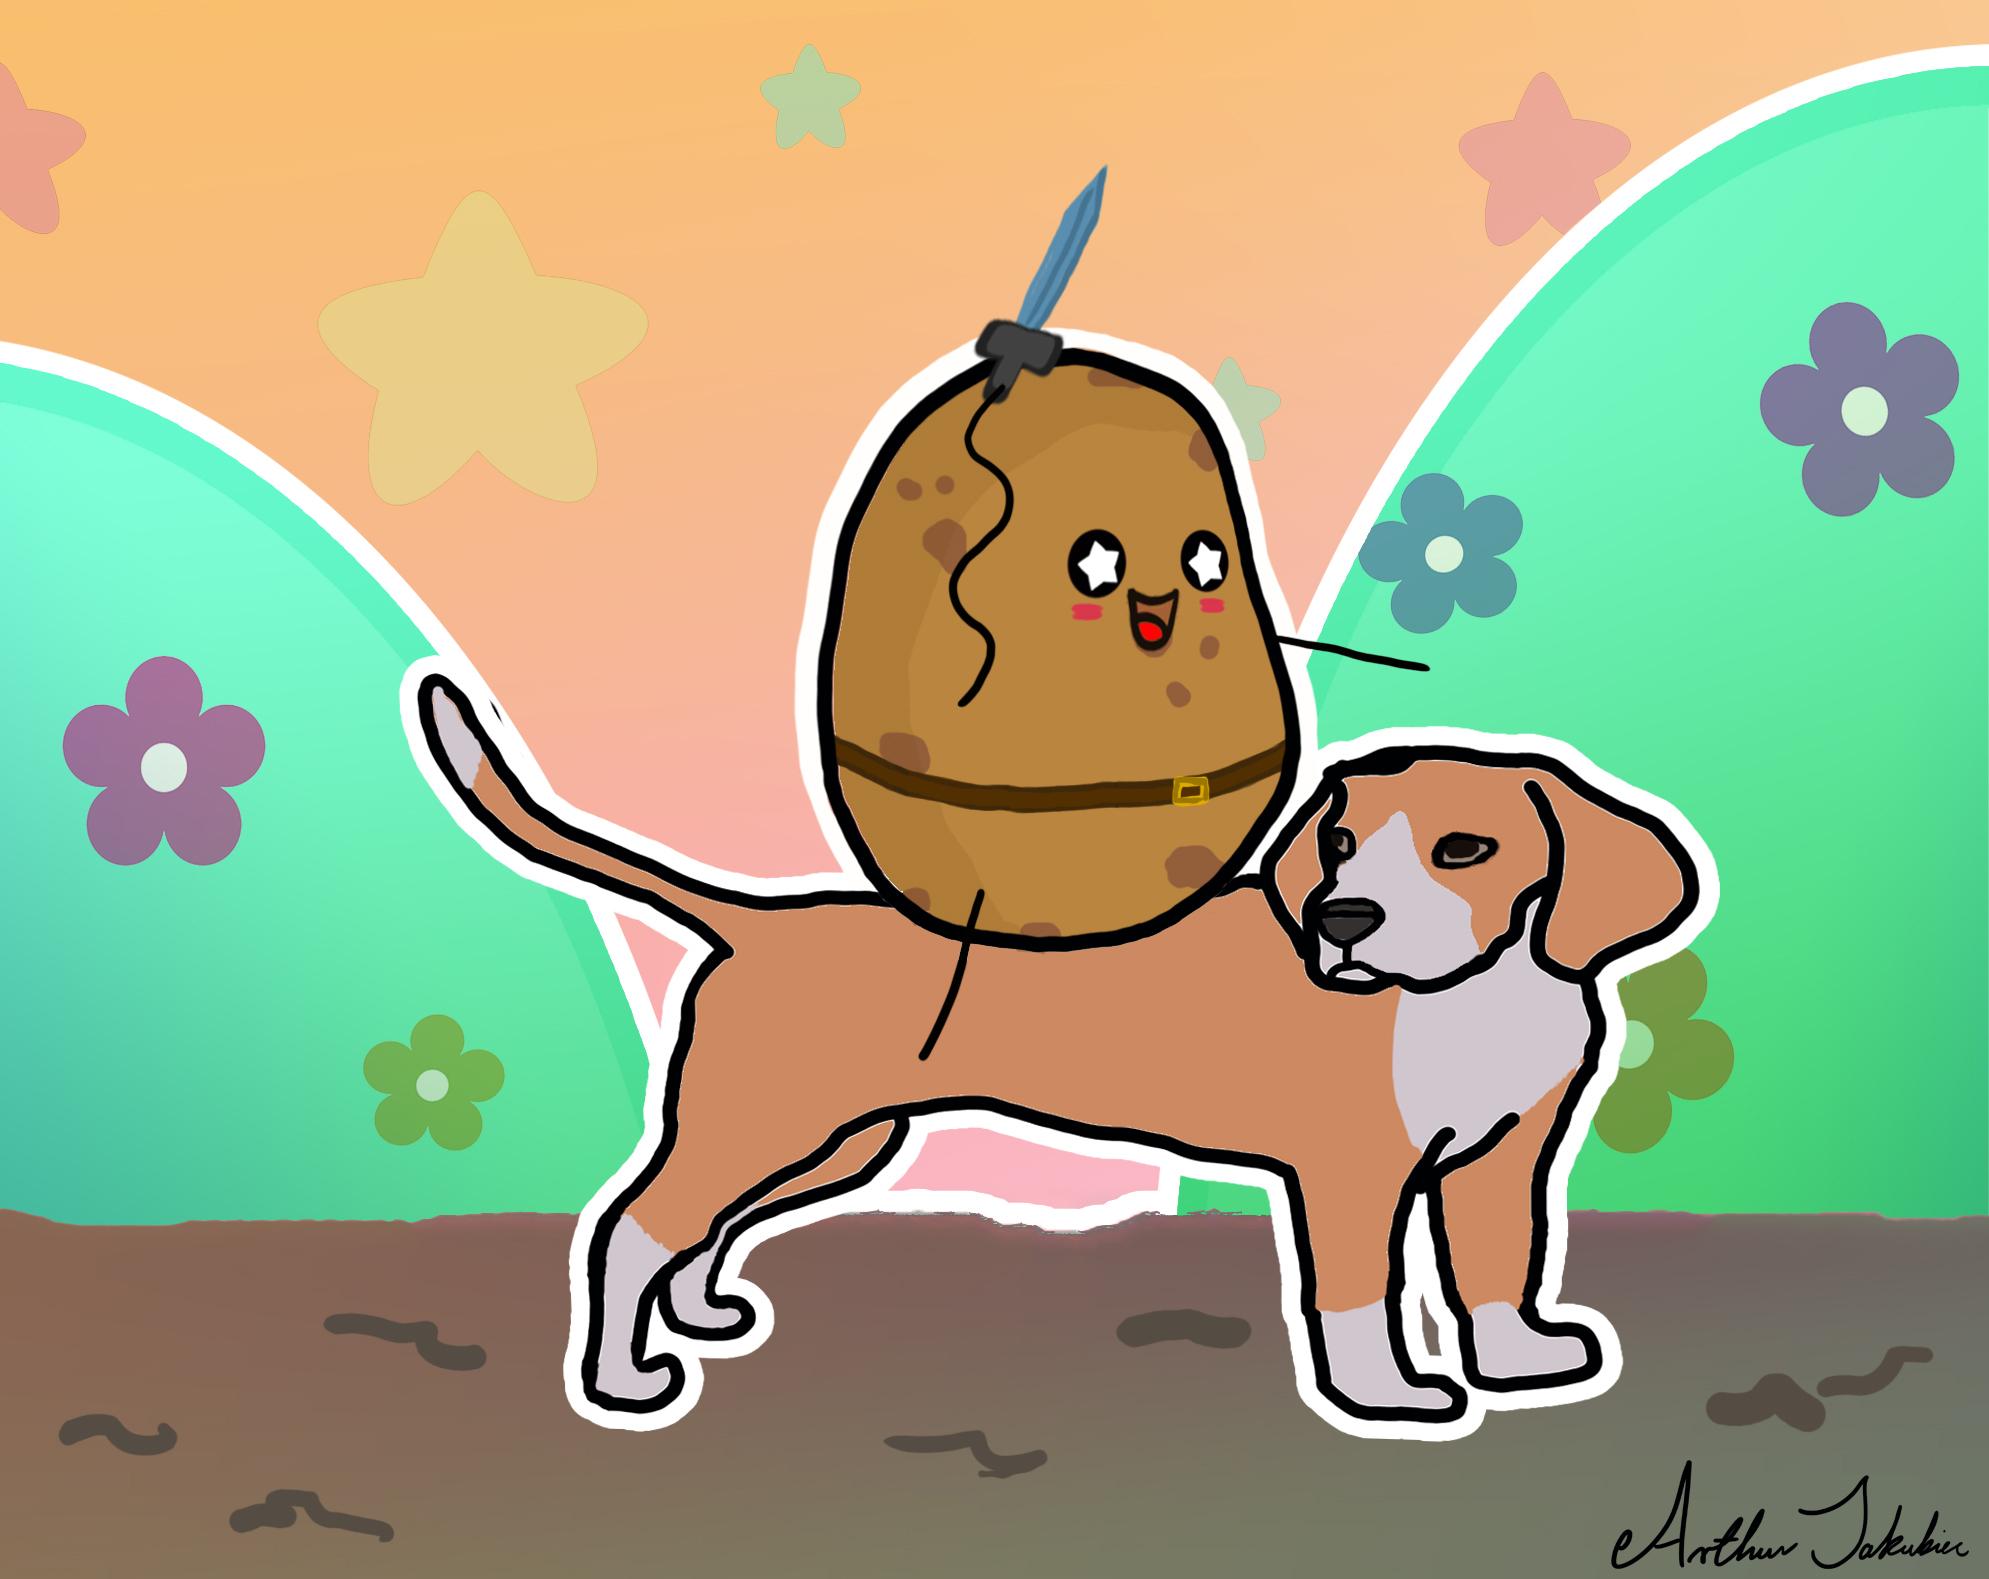 Potato with Sword Riding a Beagle